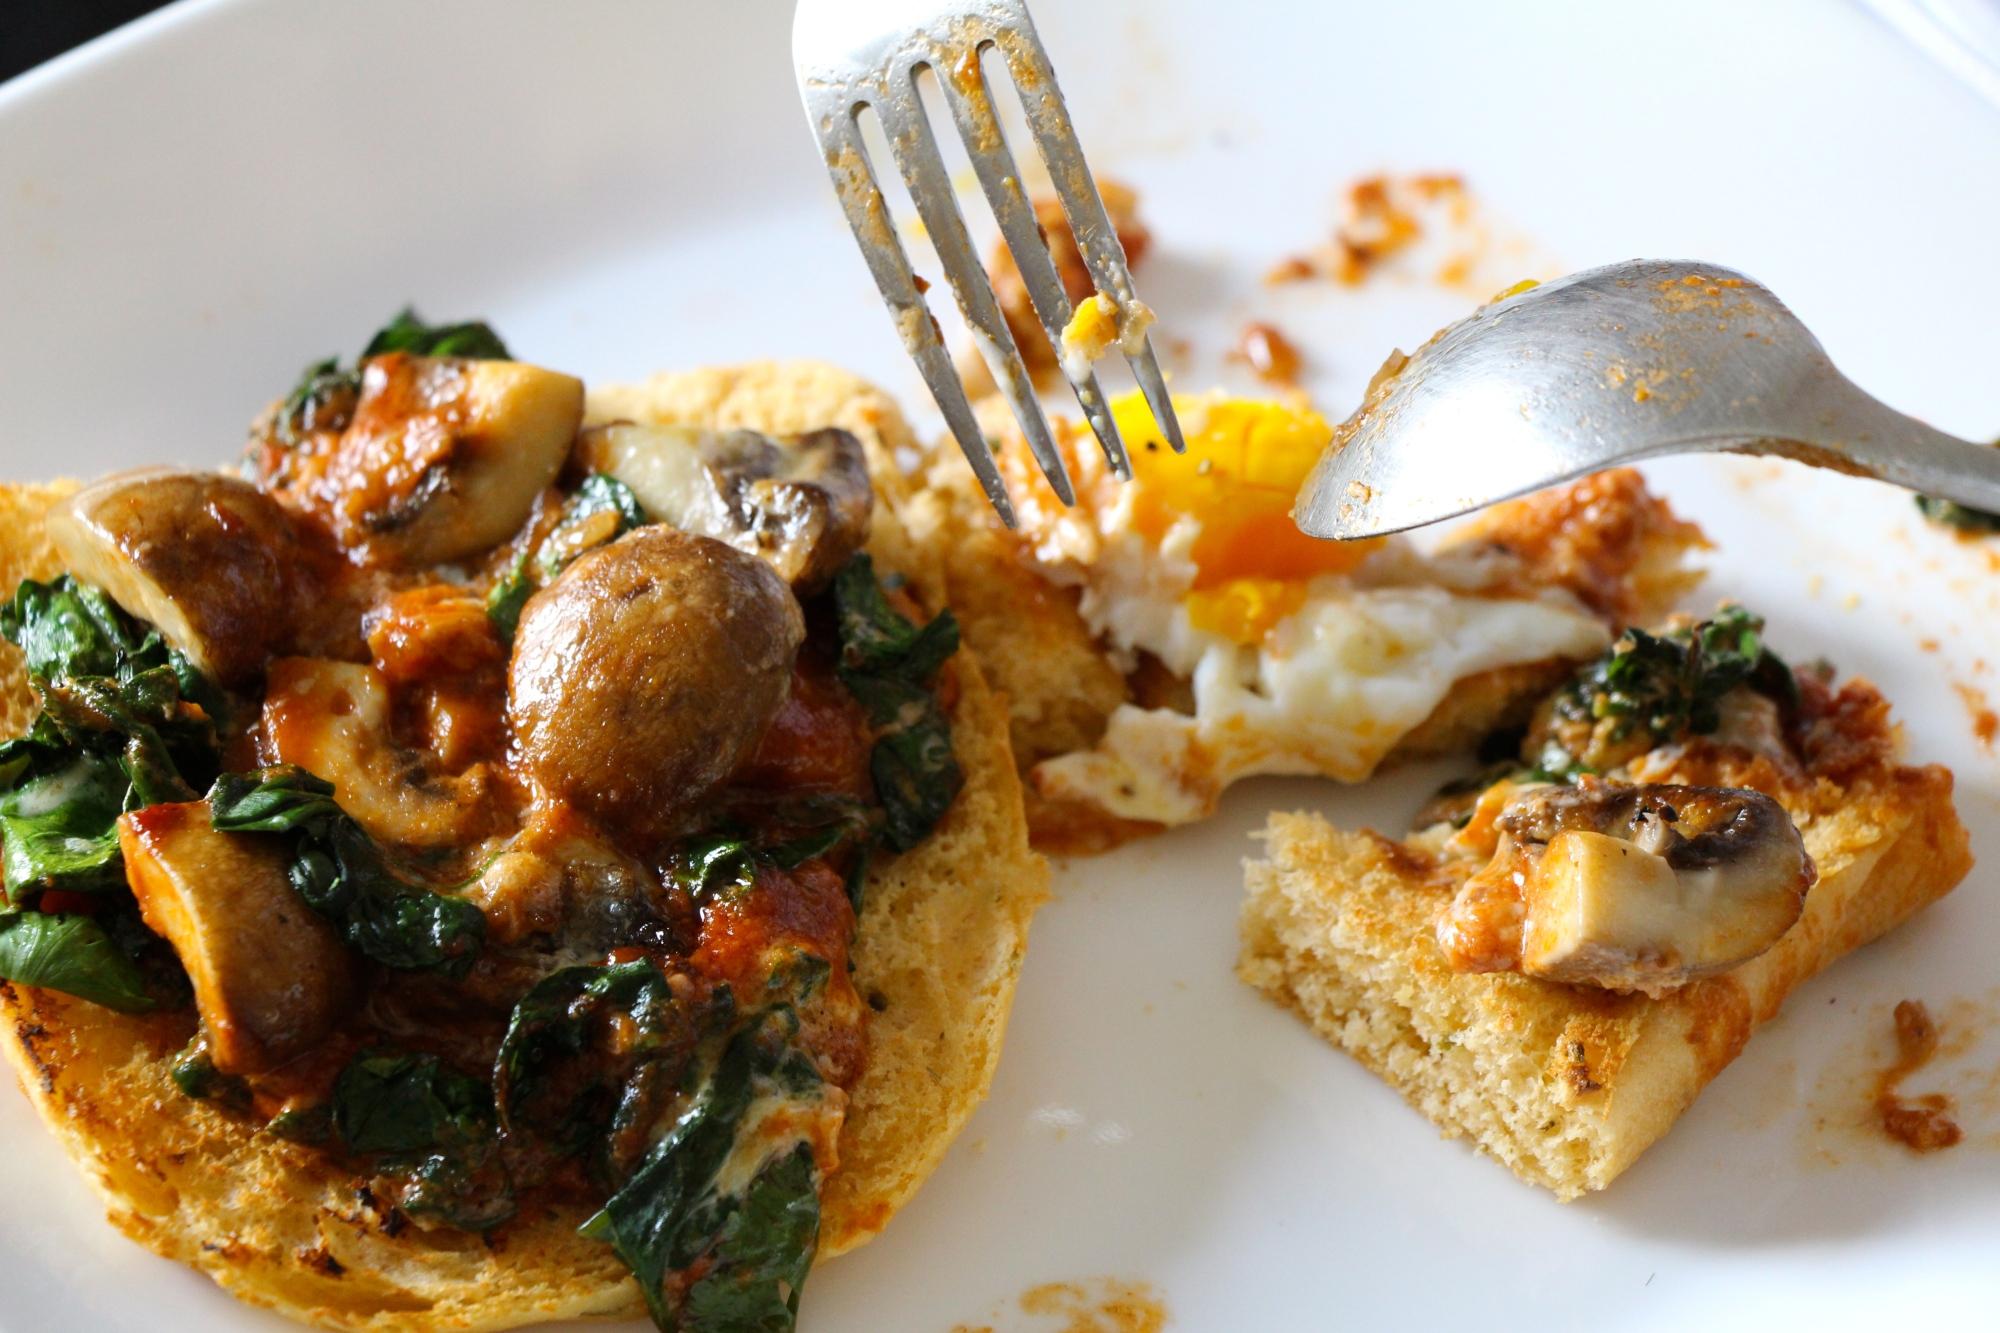 Spiced Mushroom-Spinach Baked Eggs I monsoontable.wordpress.com